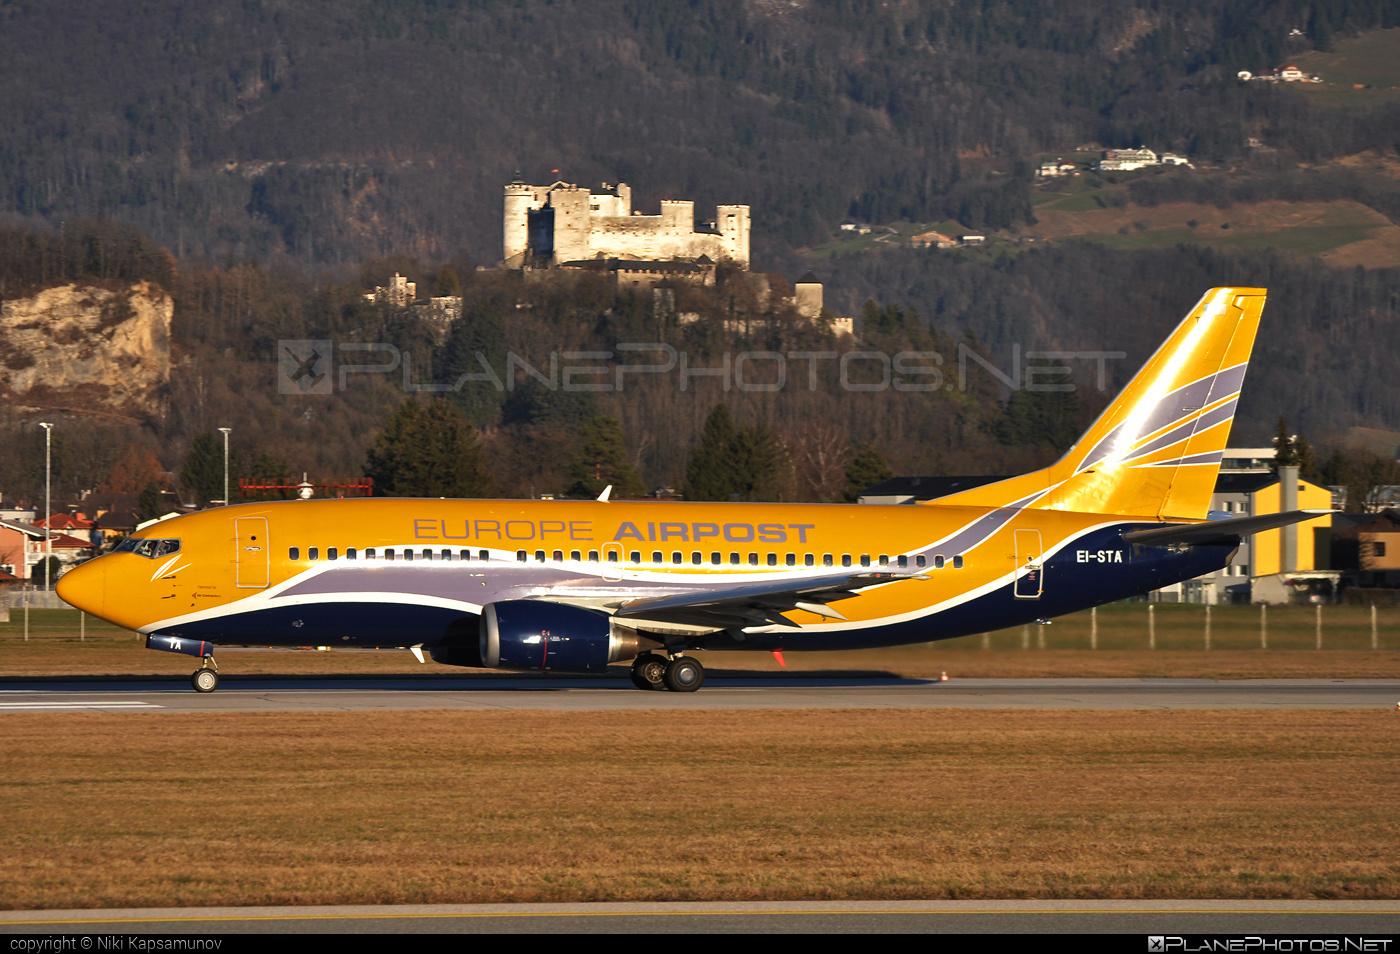 Boeing 737-300 - EI-STA operated by Europe Airpost #b737 #boeing #boeing737